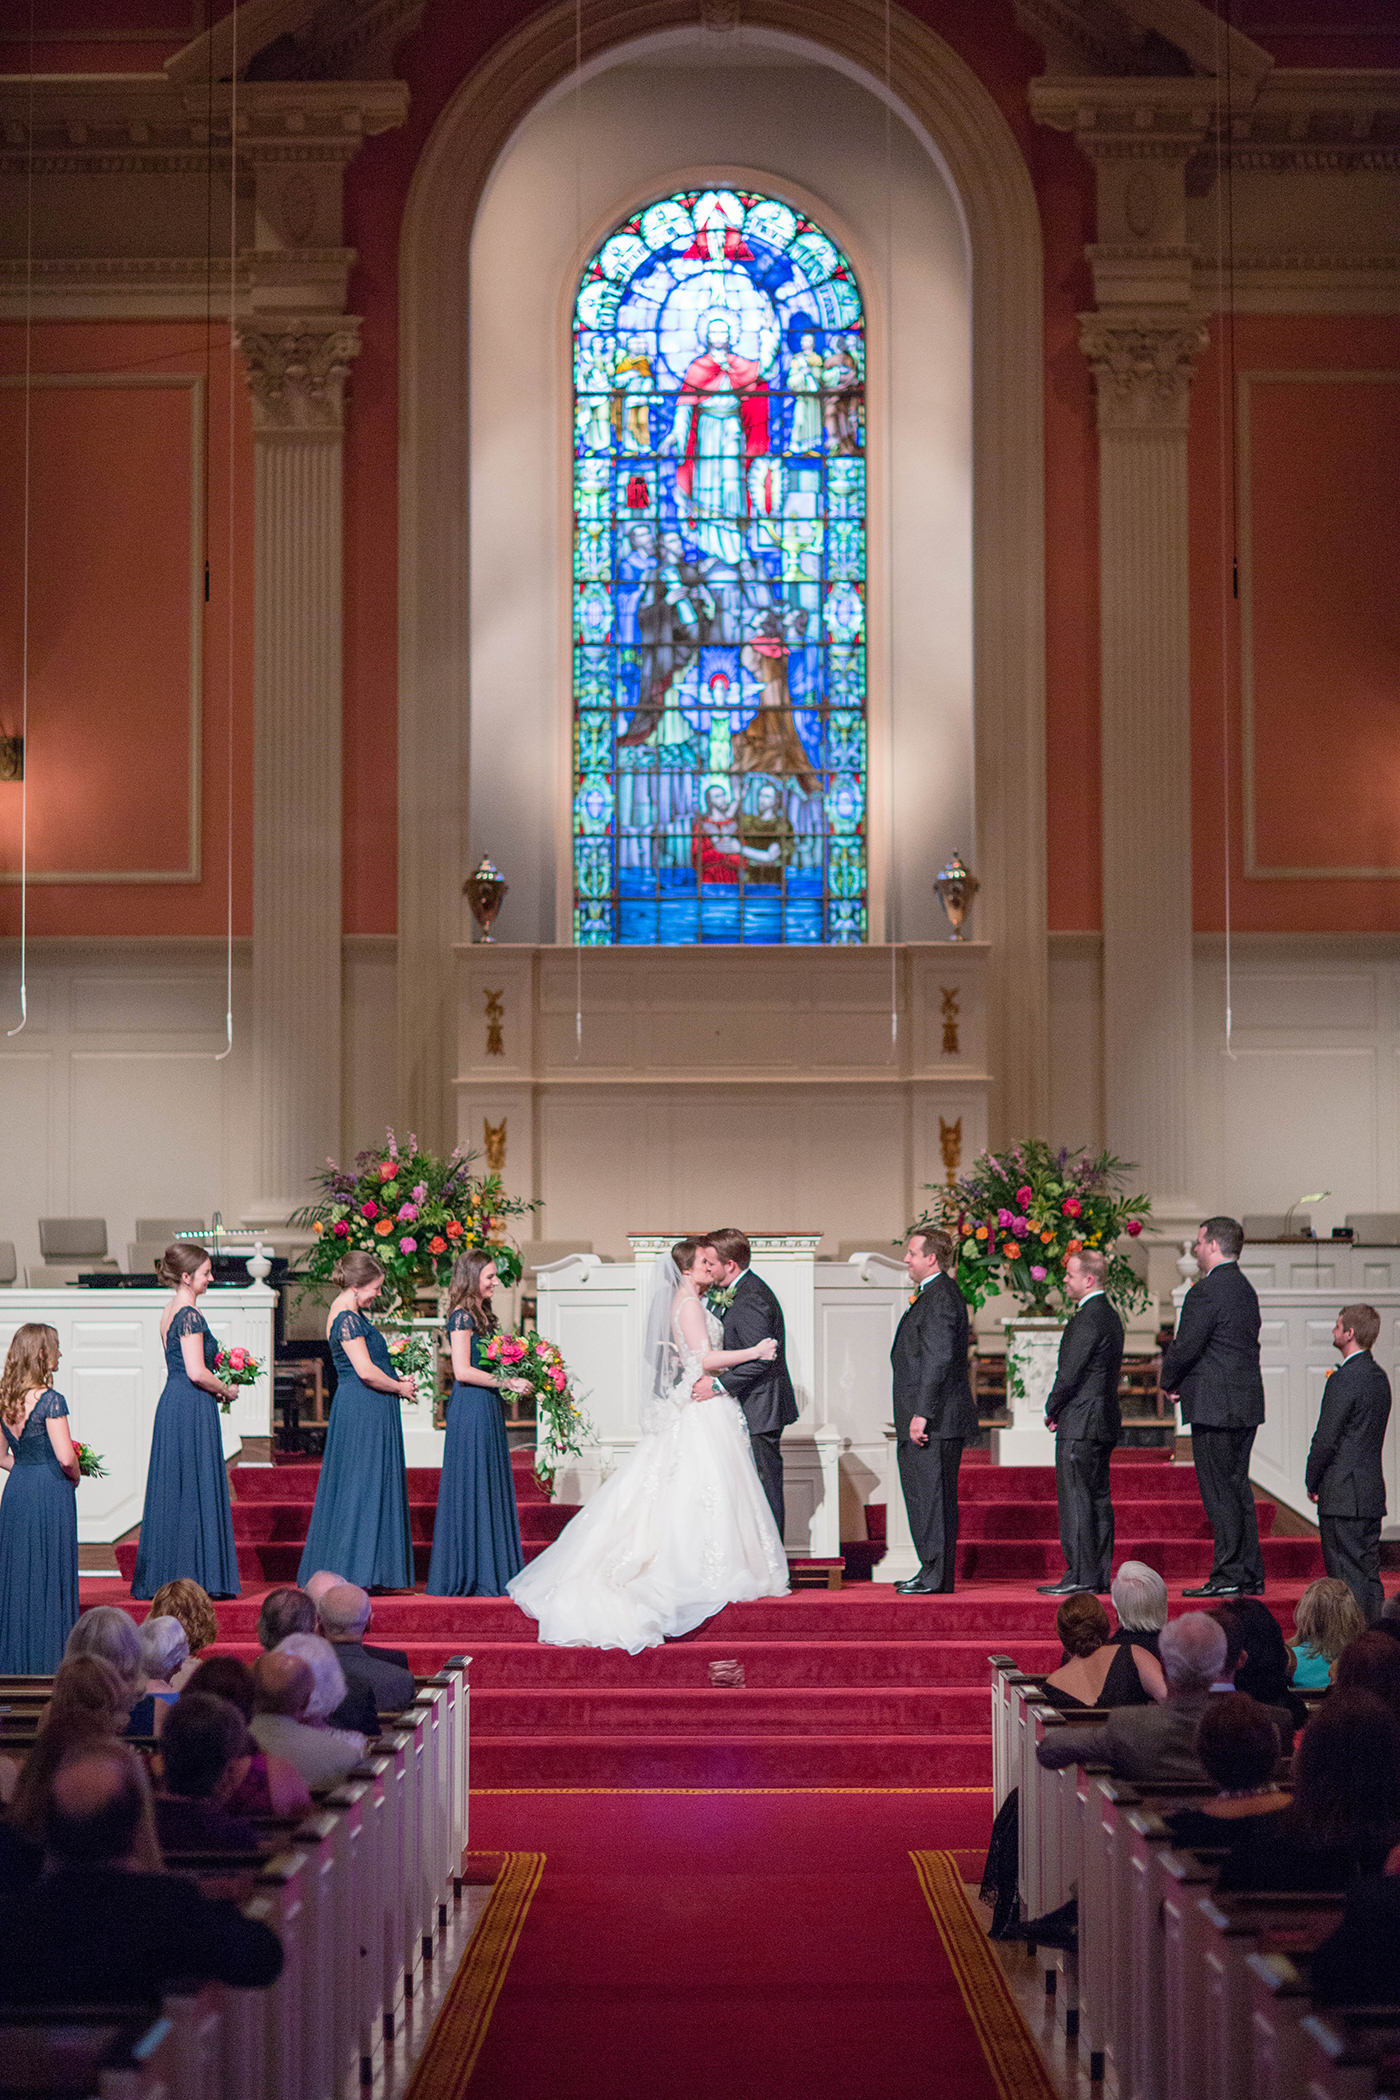 Dallas TX Wedding Planner - Allday Events - Hall on Dragon Wedding - 00014.jpg